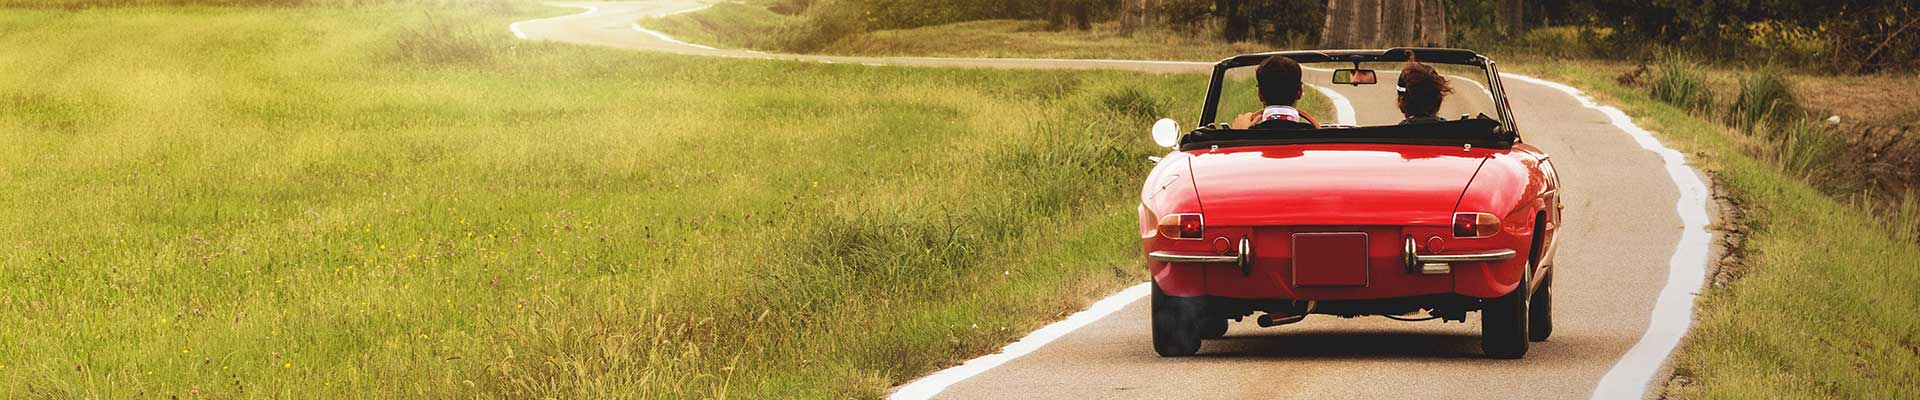 ireland-homepage-car